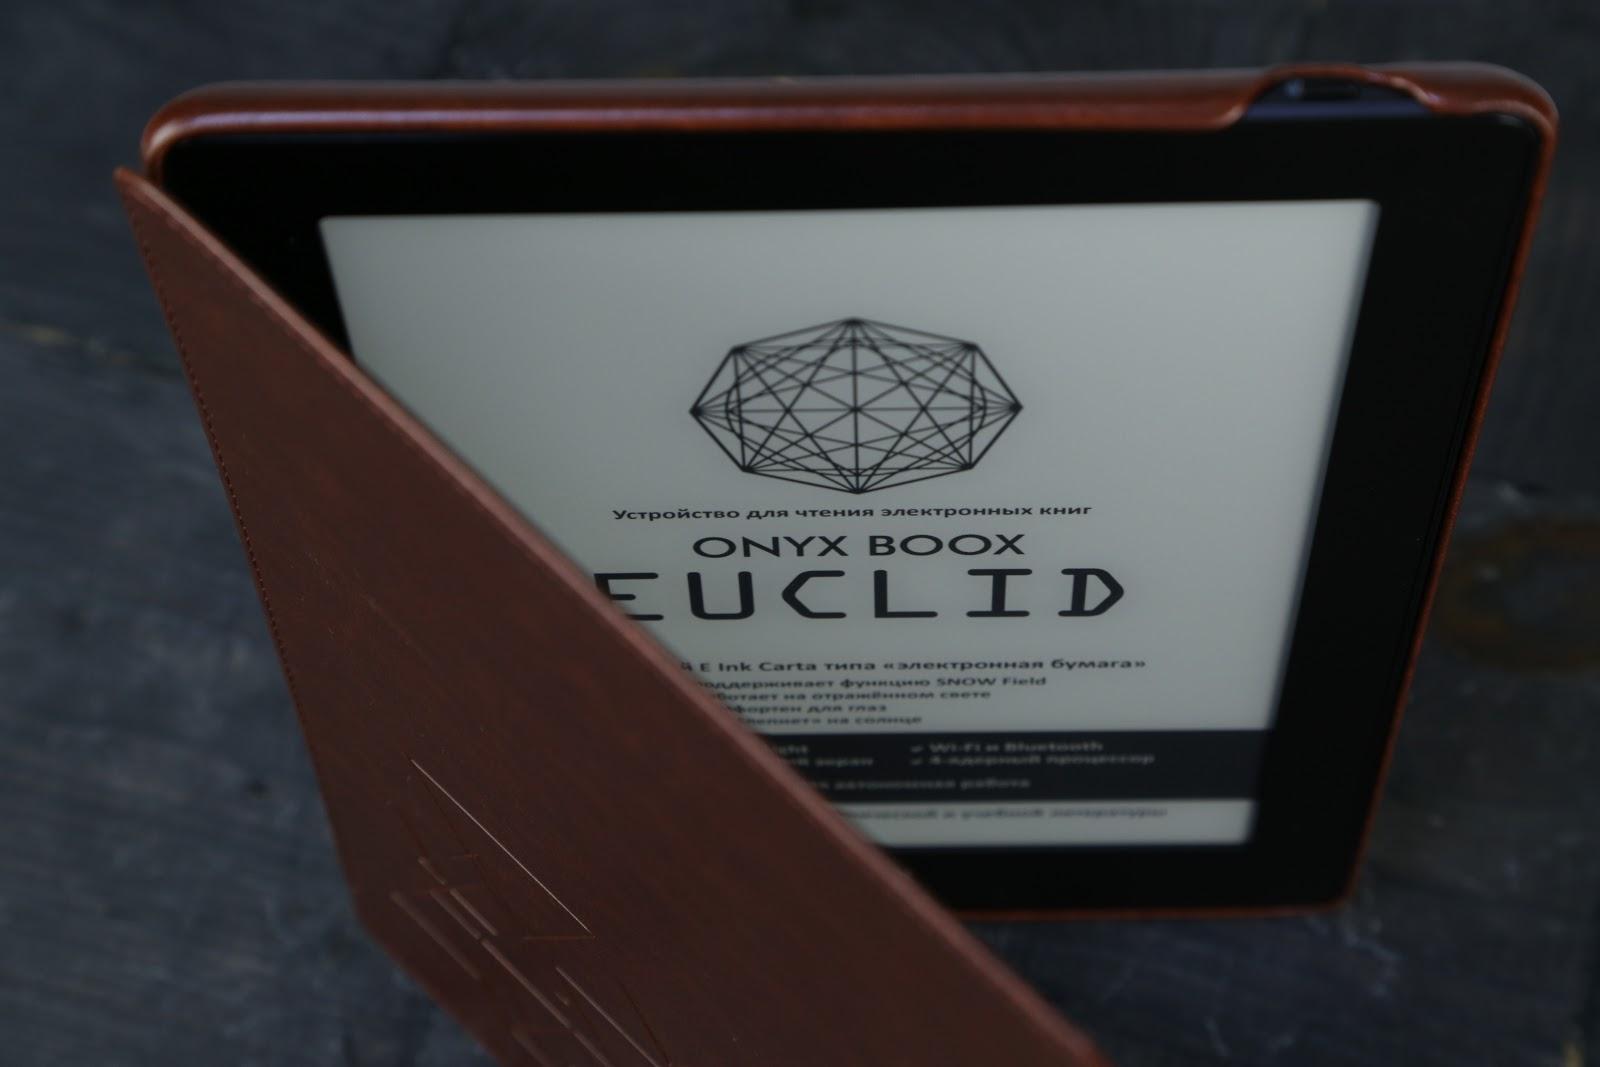 Когда теорема стала аксиомой: обзор ONYX BOOX Euclid - 1